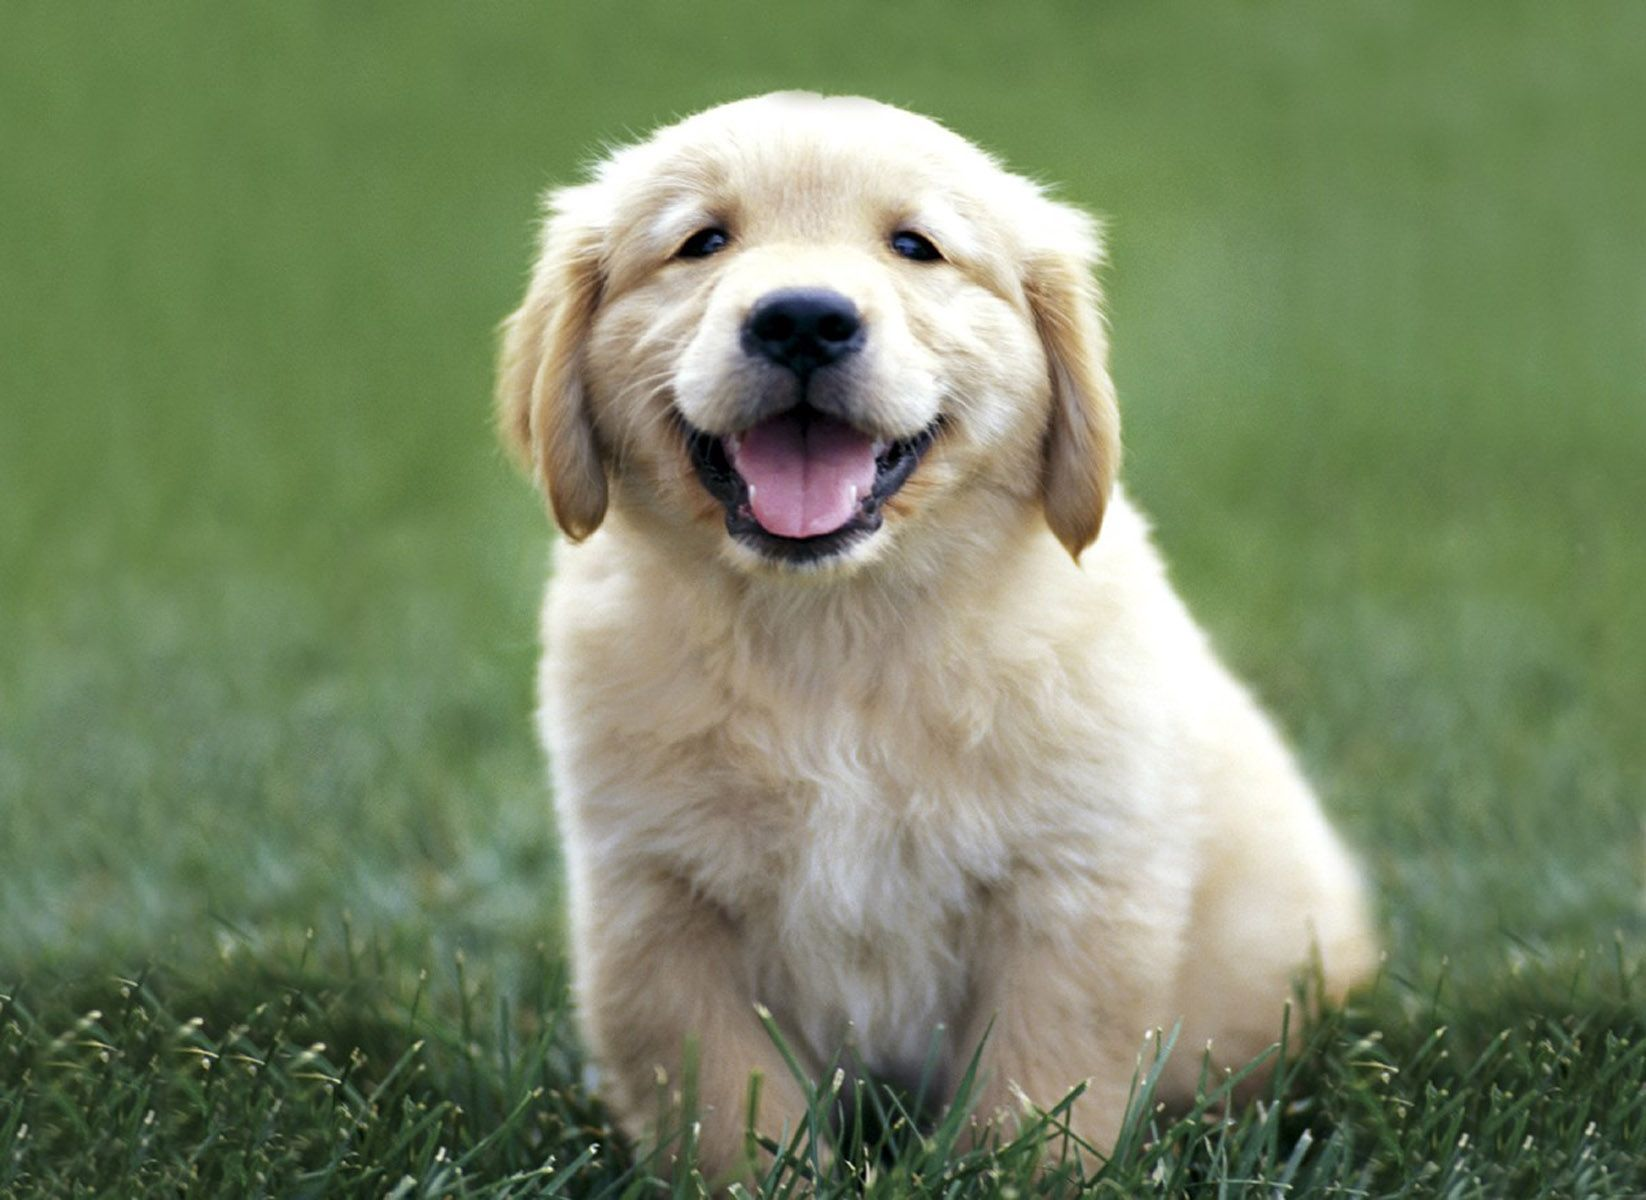 Google Image Result For Http Oldhamrealestate Files Wordpress Com 2010 08 Gol Retriever Puppy Golden Retriever Puppy Training Golden Retriever Baby